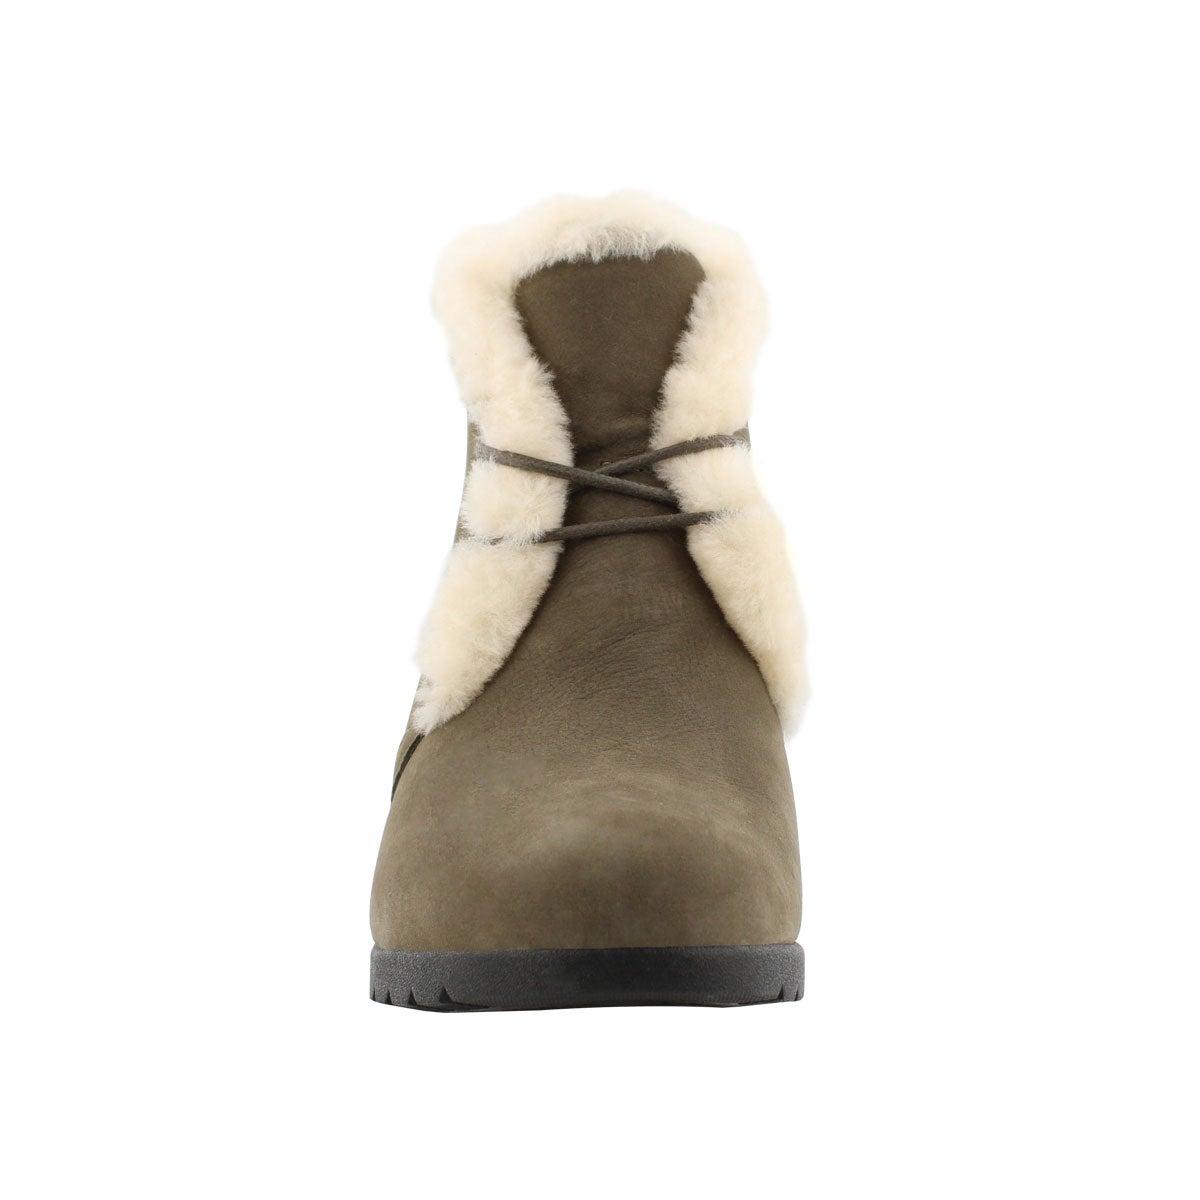 Lds Jeovana mystr laceup wtpf wedge boot